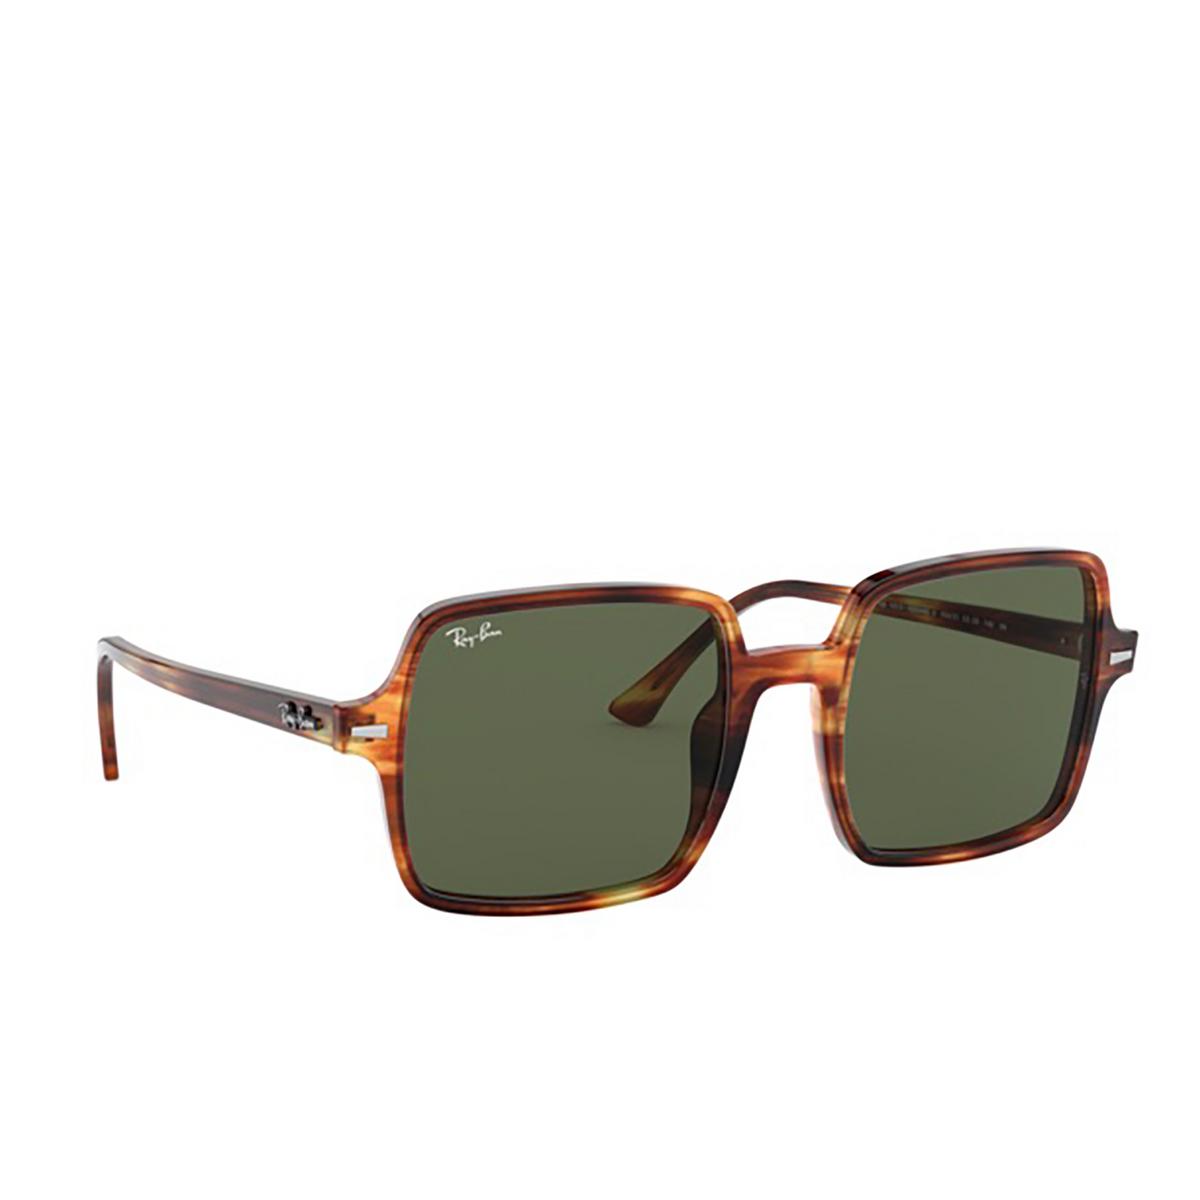 Ray-Ban® Square Sunglasses: Square Ii RB1973 color Striped Havana 954/31 - three-quarters view.